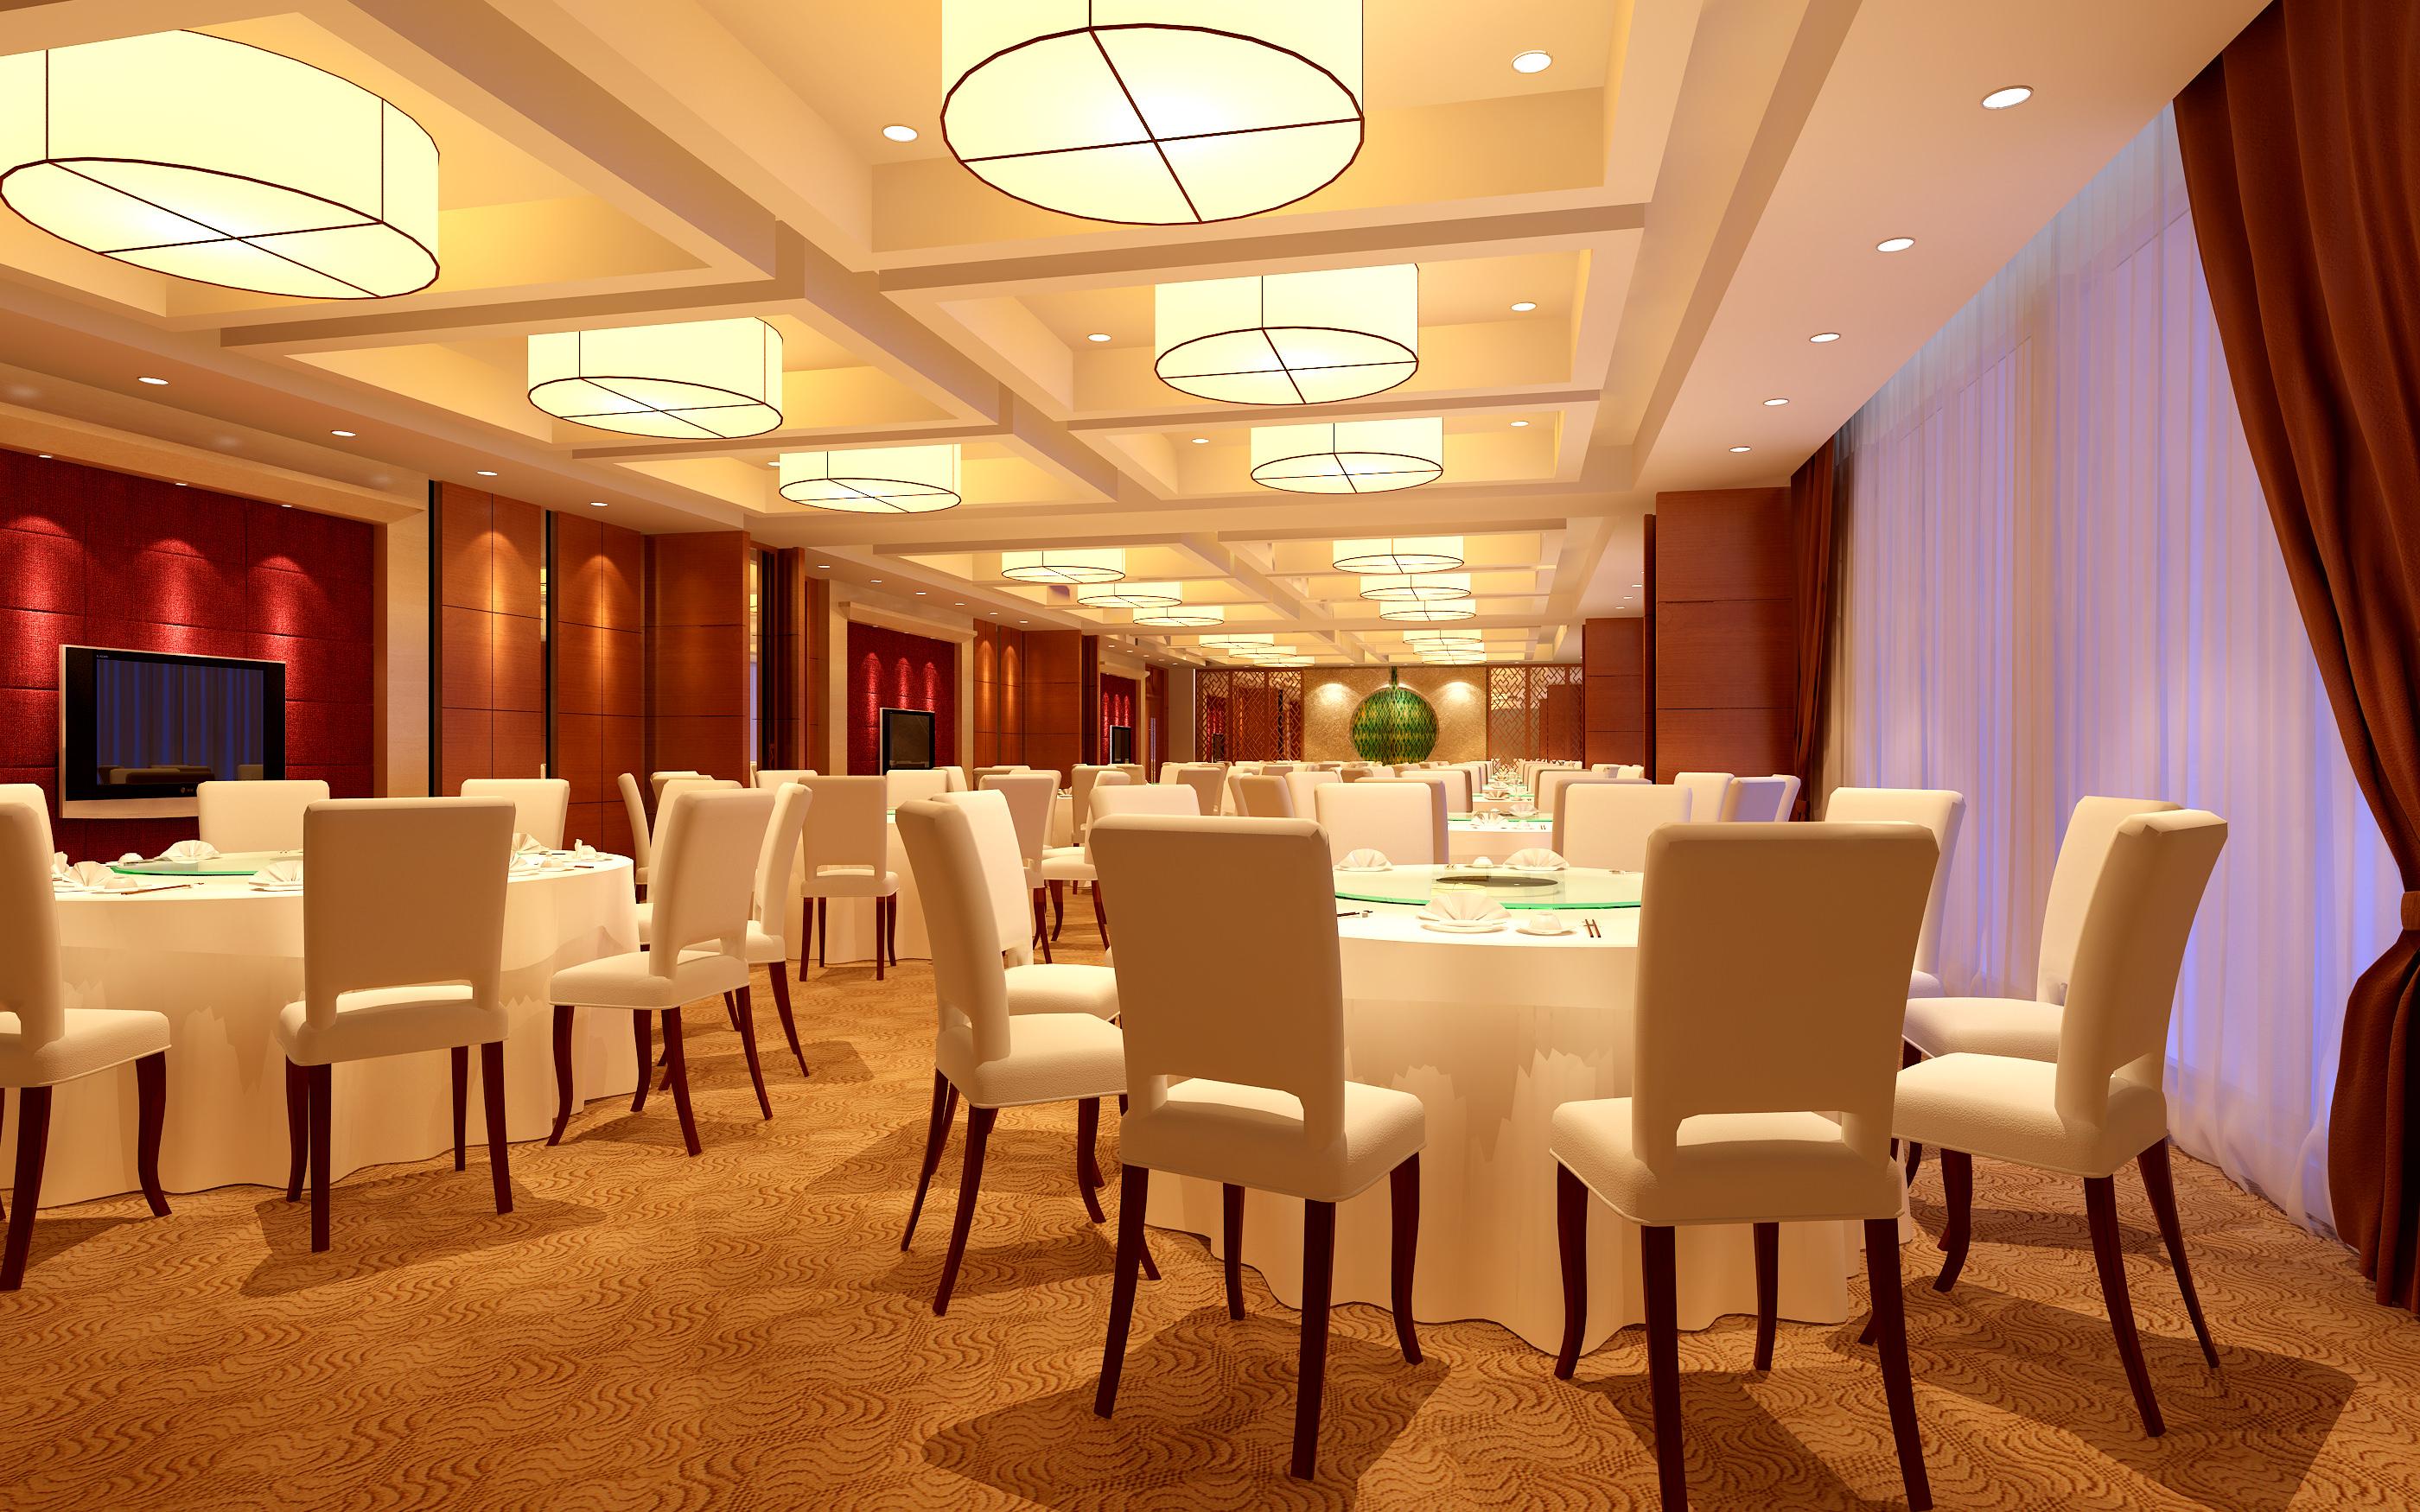 Luxury restaurant furniture - Luxury Restaurant With White Furniture 3d Model Max 1